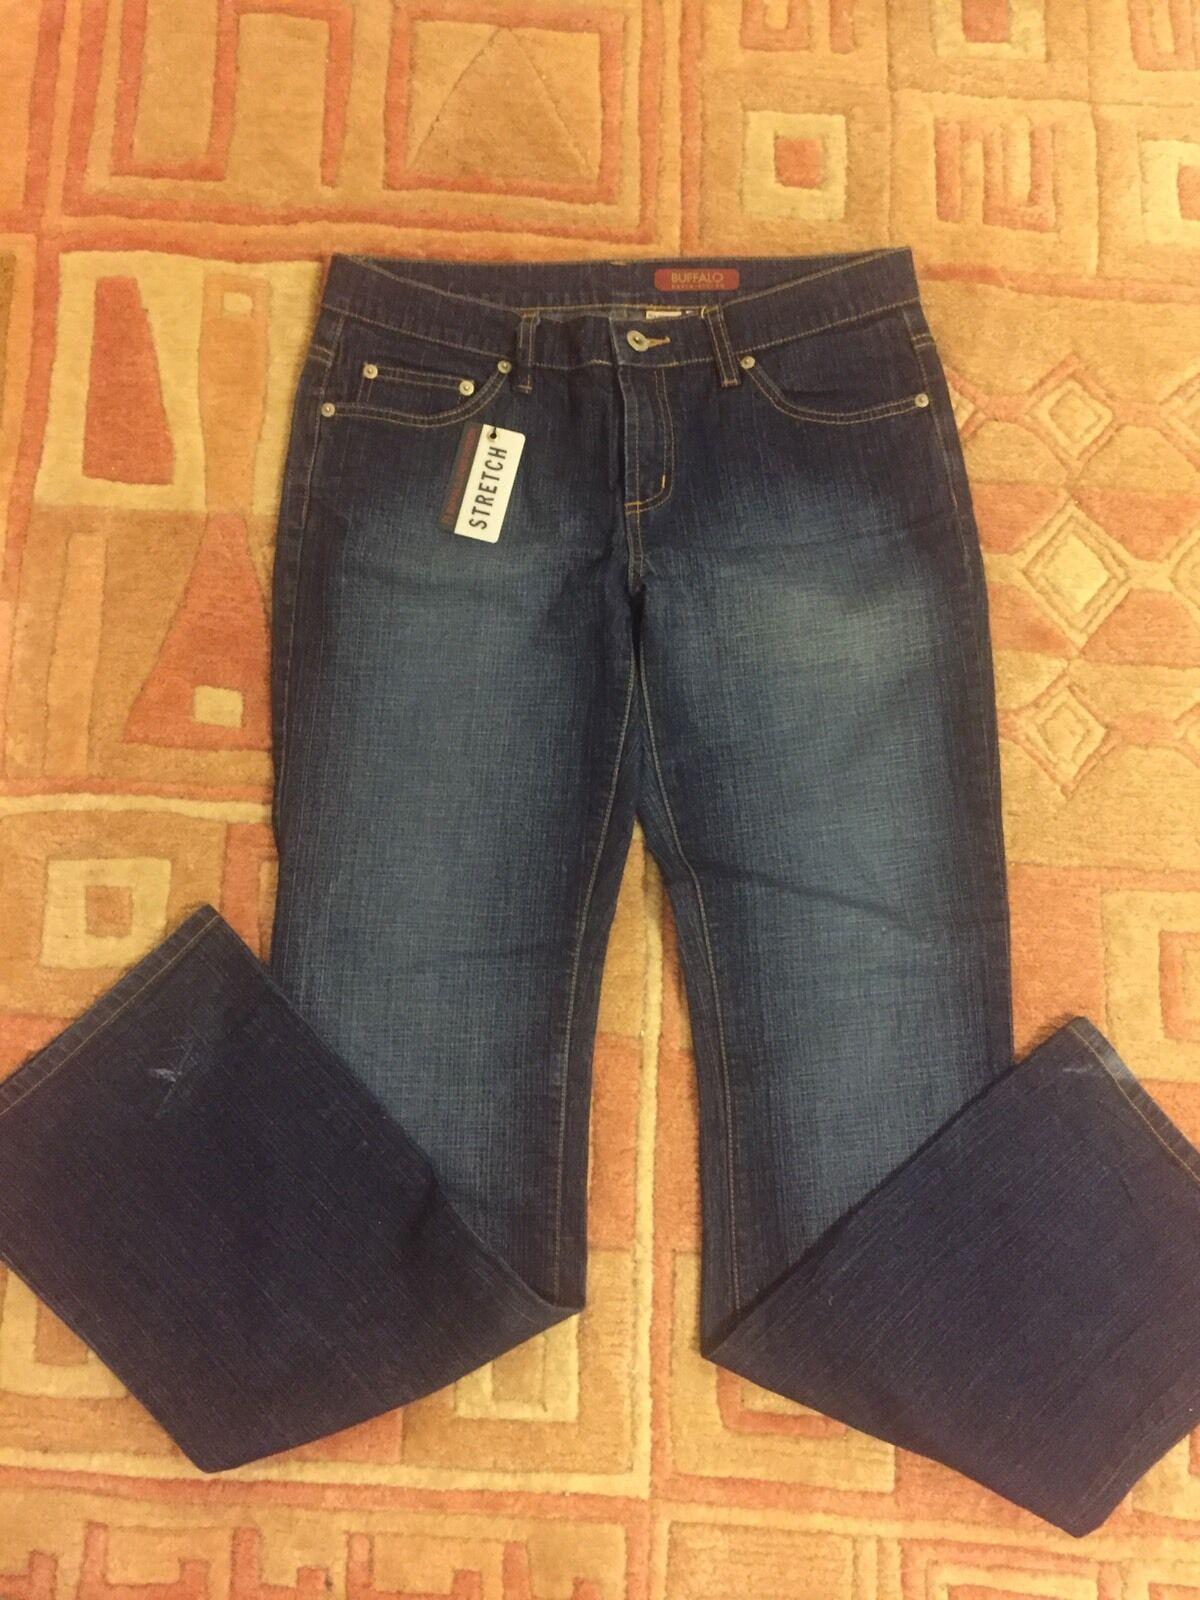 NWT Buffalo David Bitton Womens Size 29  Mid Rise Stretch Flare Denim Jeans